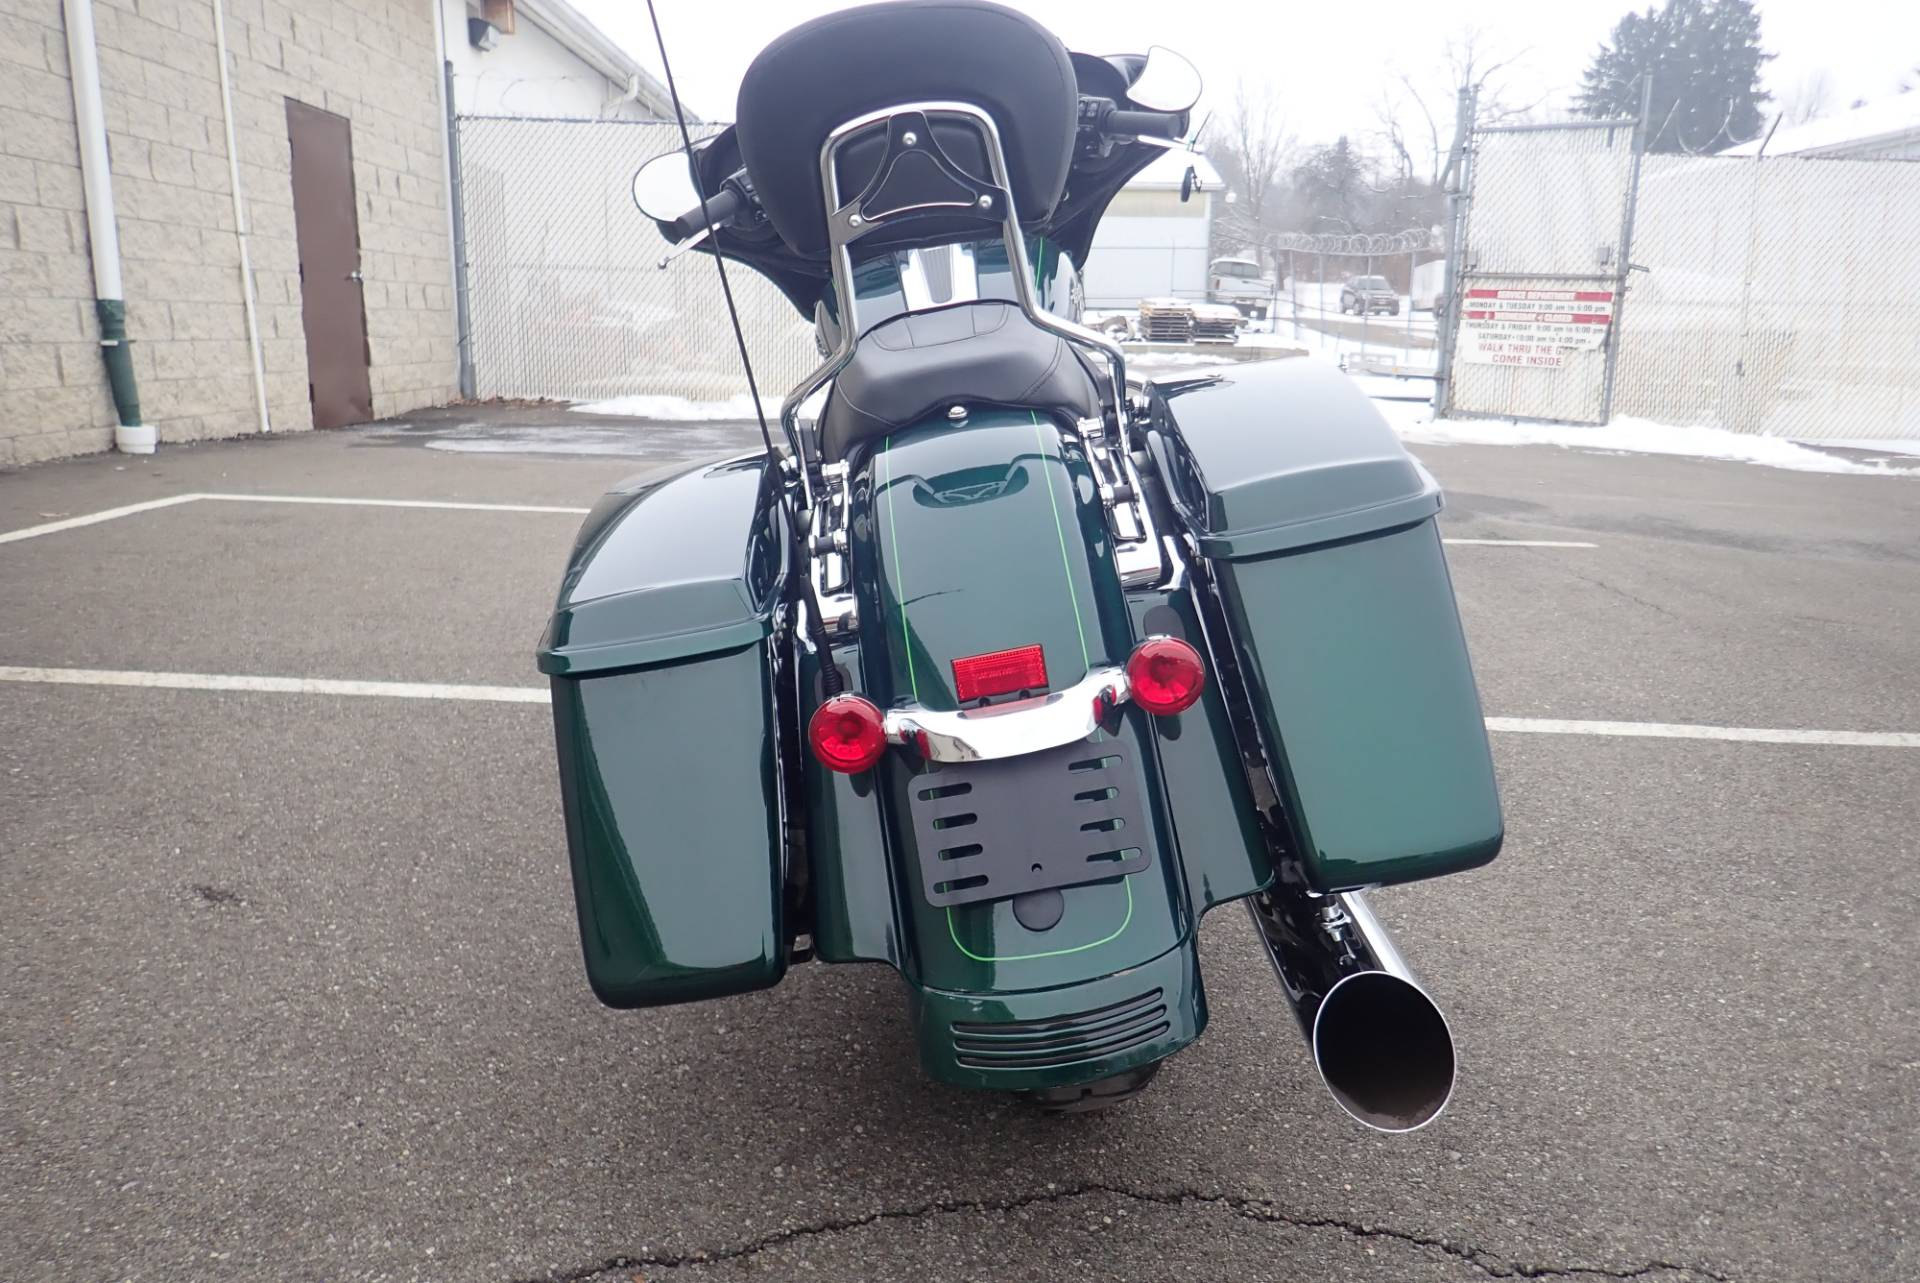 2015 Harley-Davidson Street Glide Special 12